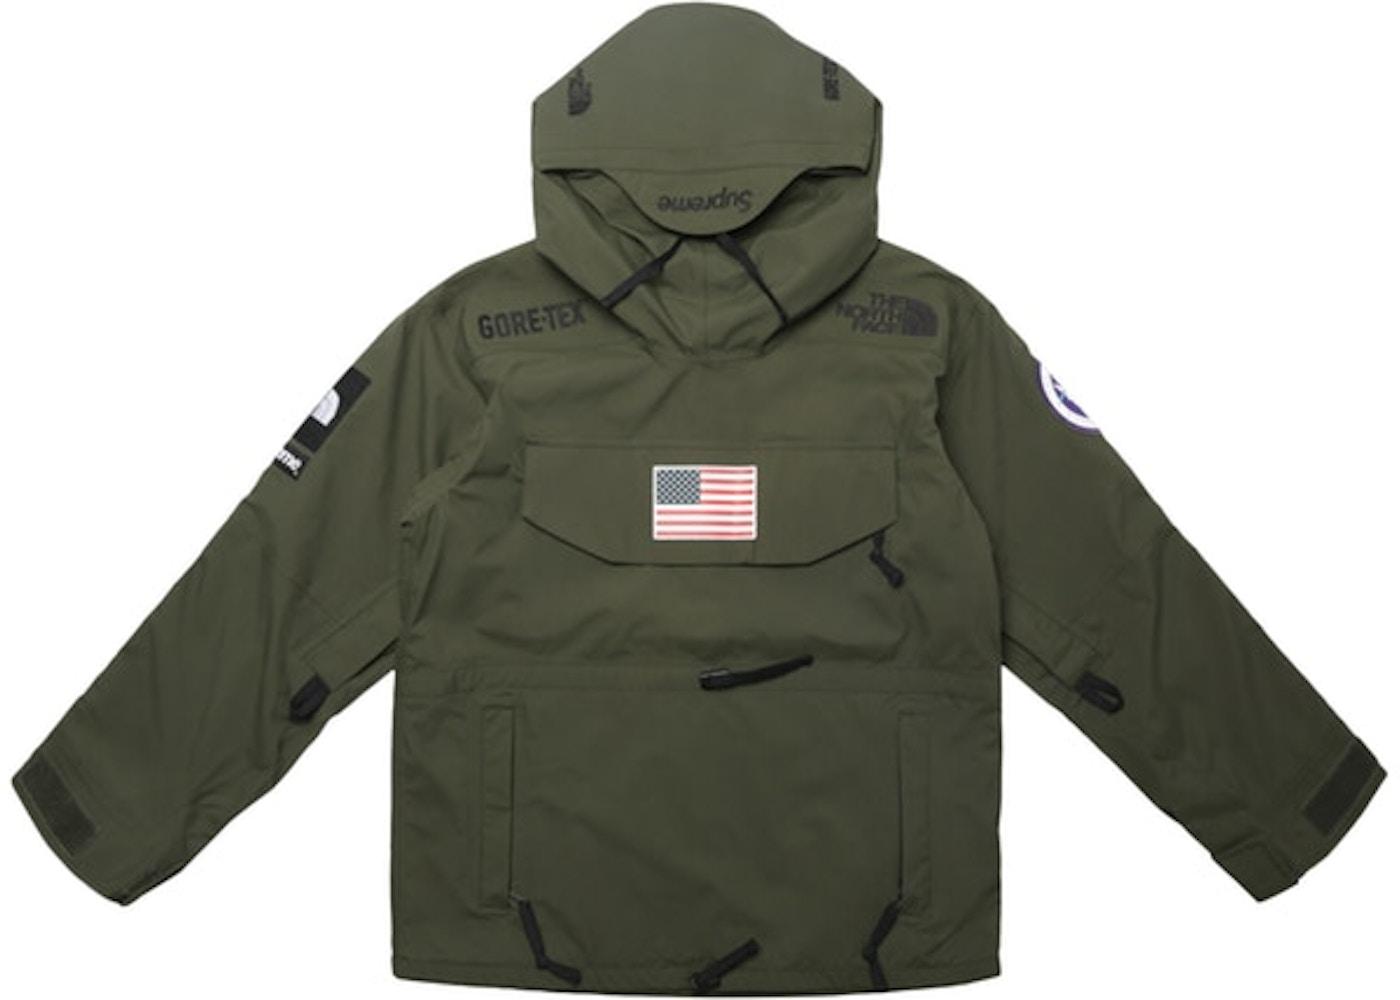 bester Verkauf populärer Stil Kostenloser Versand Supreme The North Face Trans Antarctica Expedition Pullover Jacket Olive